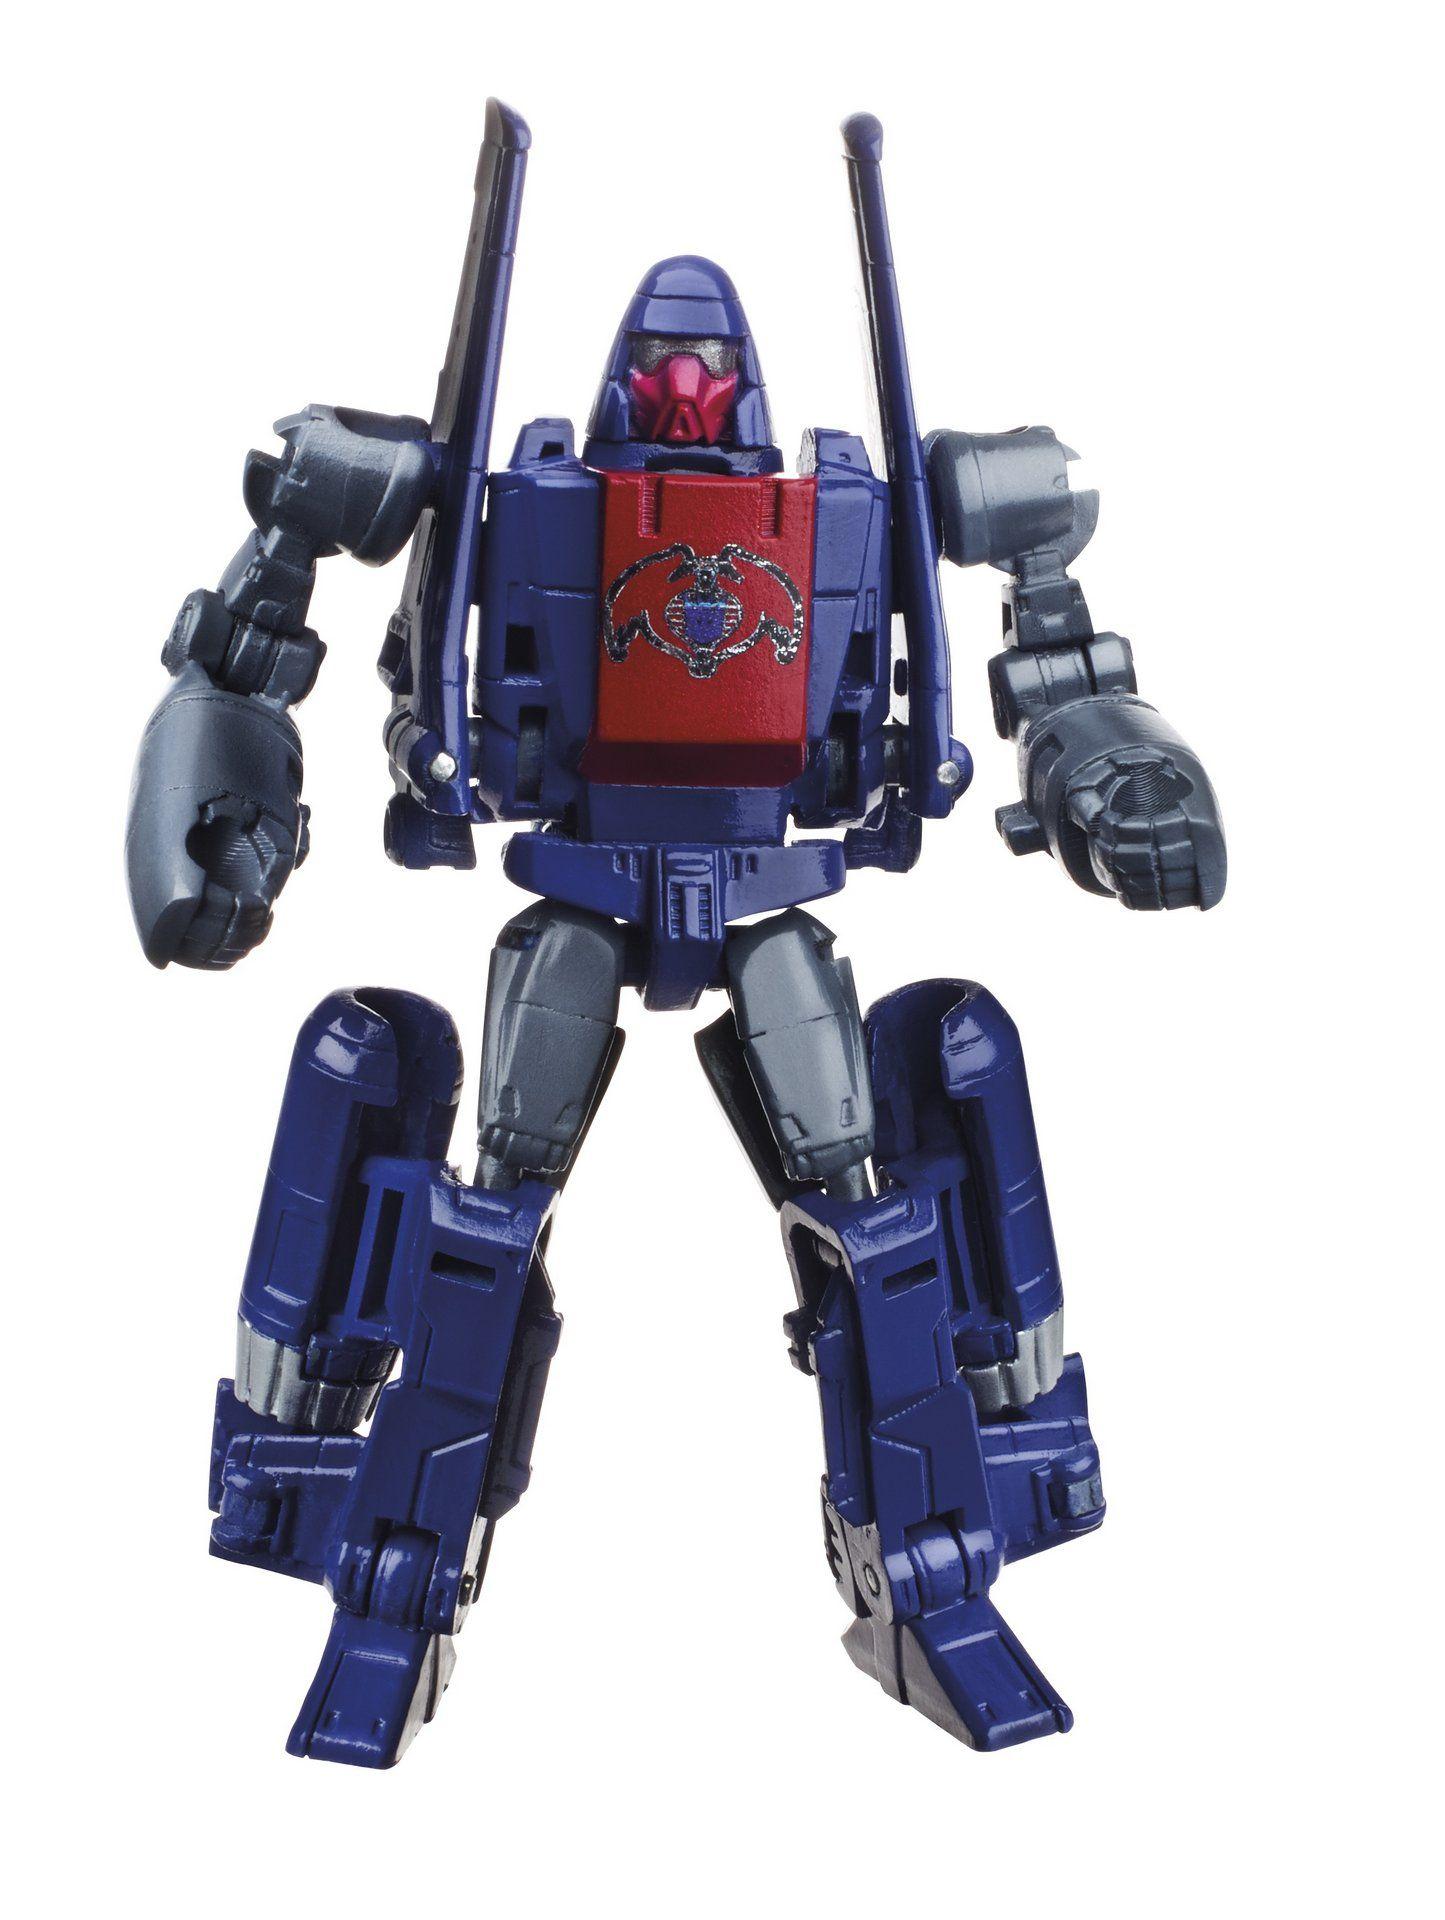 Hasbro Transformers IDW Combiner Wars Powerglide Legends Action Figures Toy